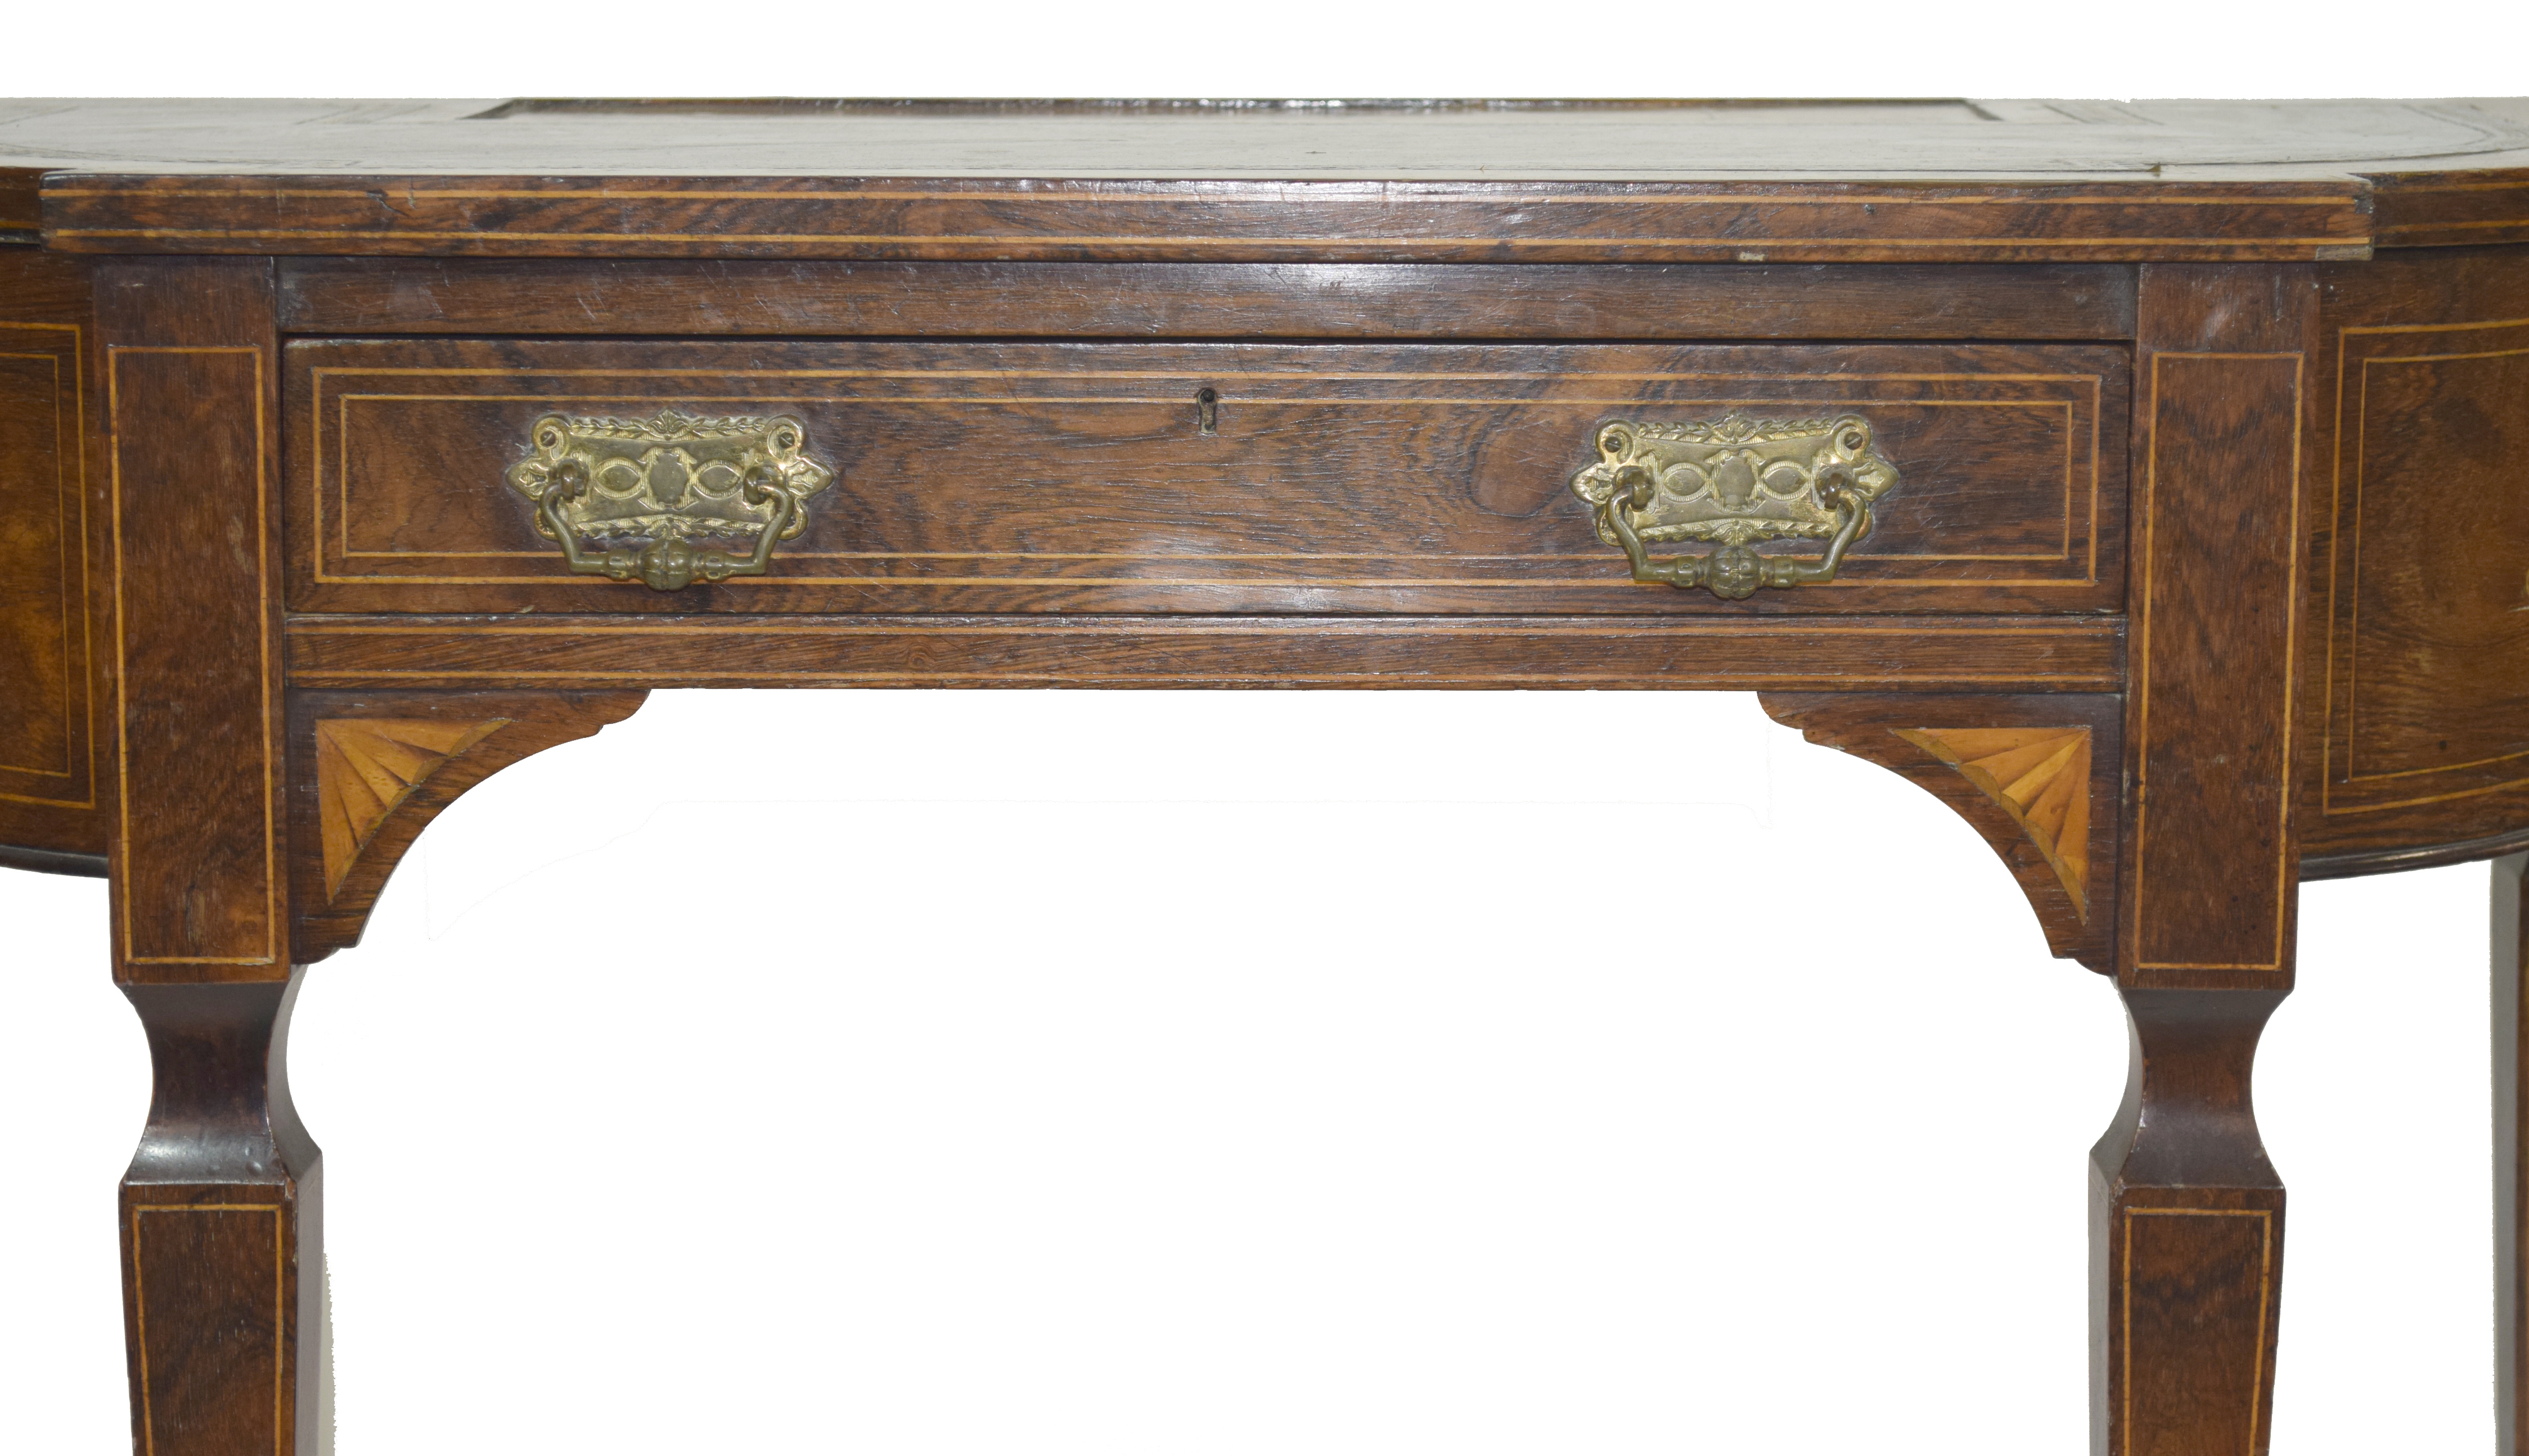 Late 19th century walnut veneered writing desk - Image 4 of 8